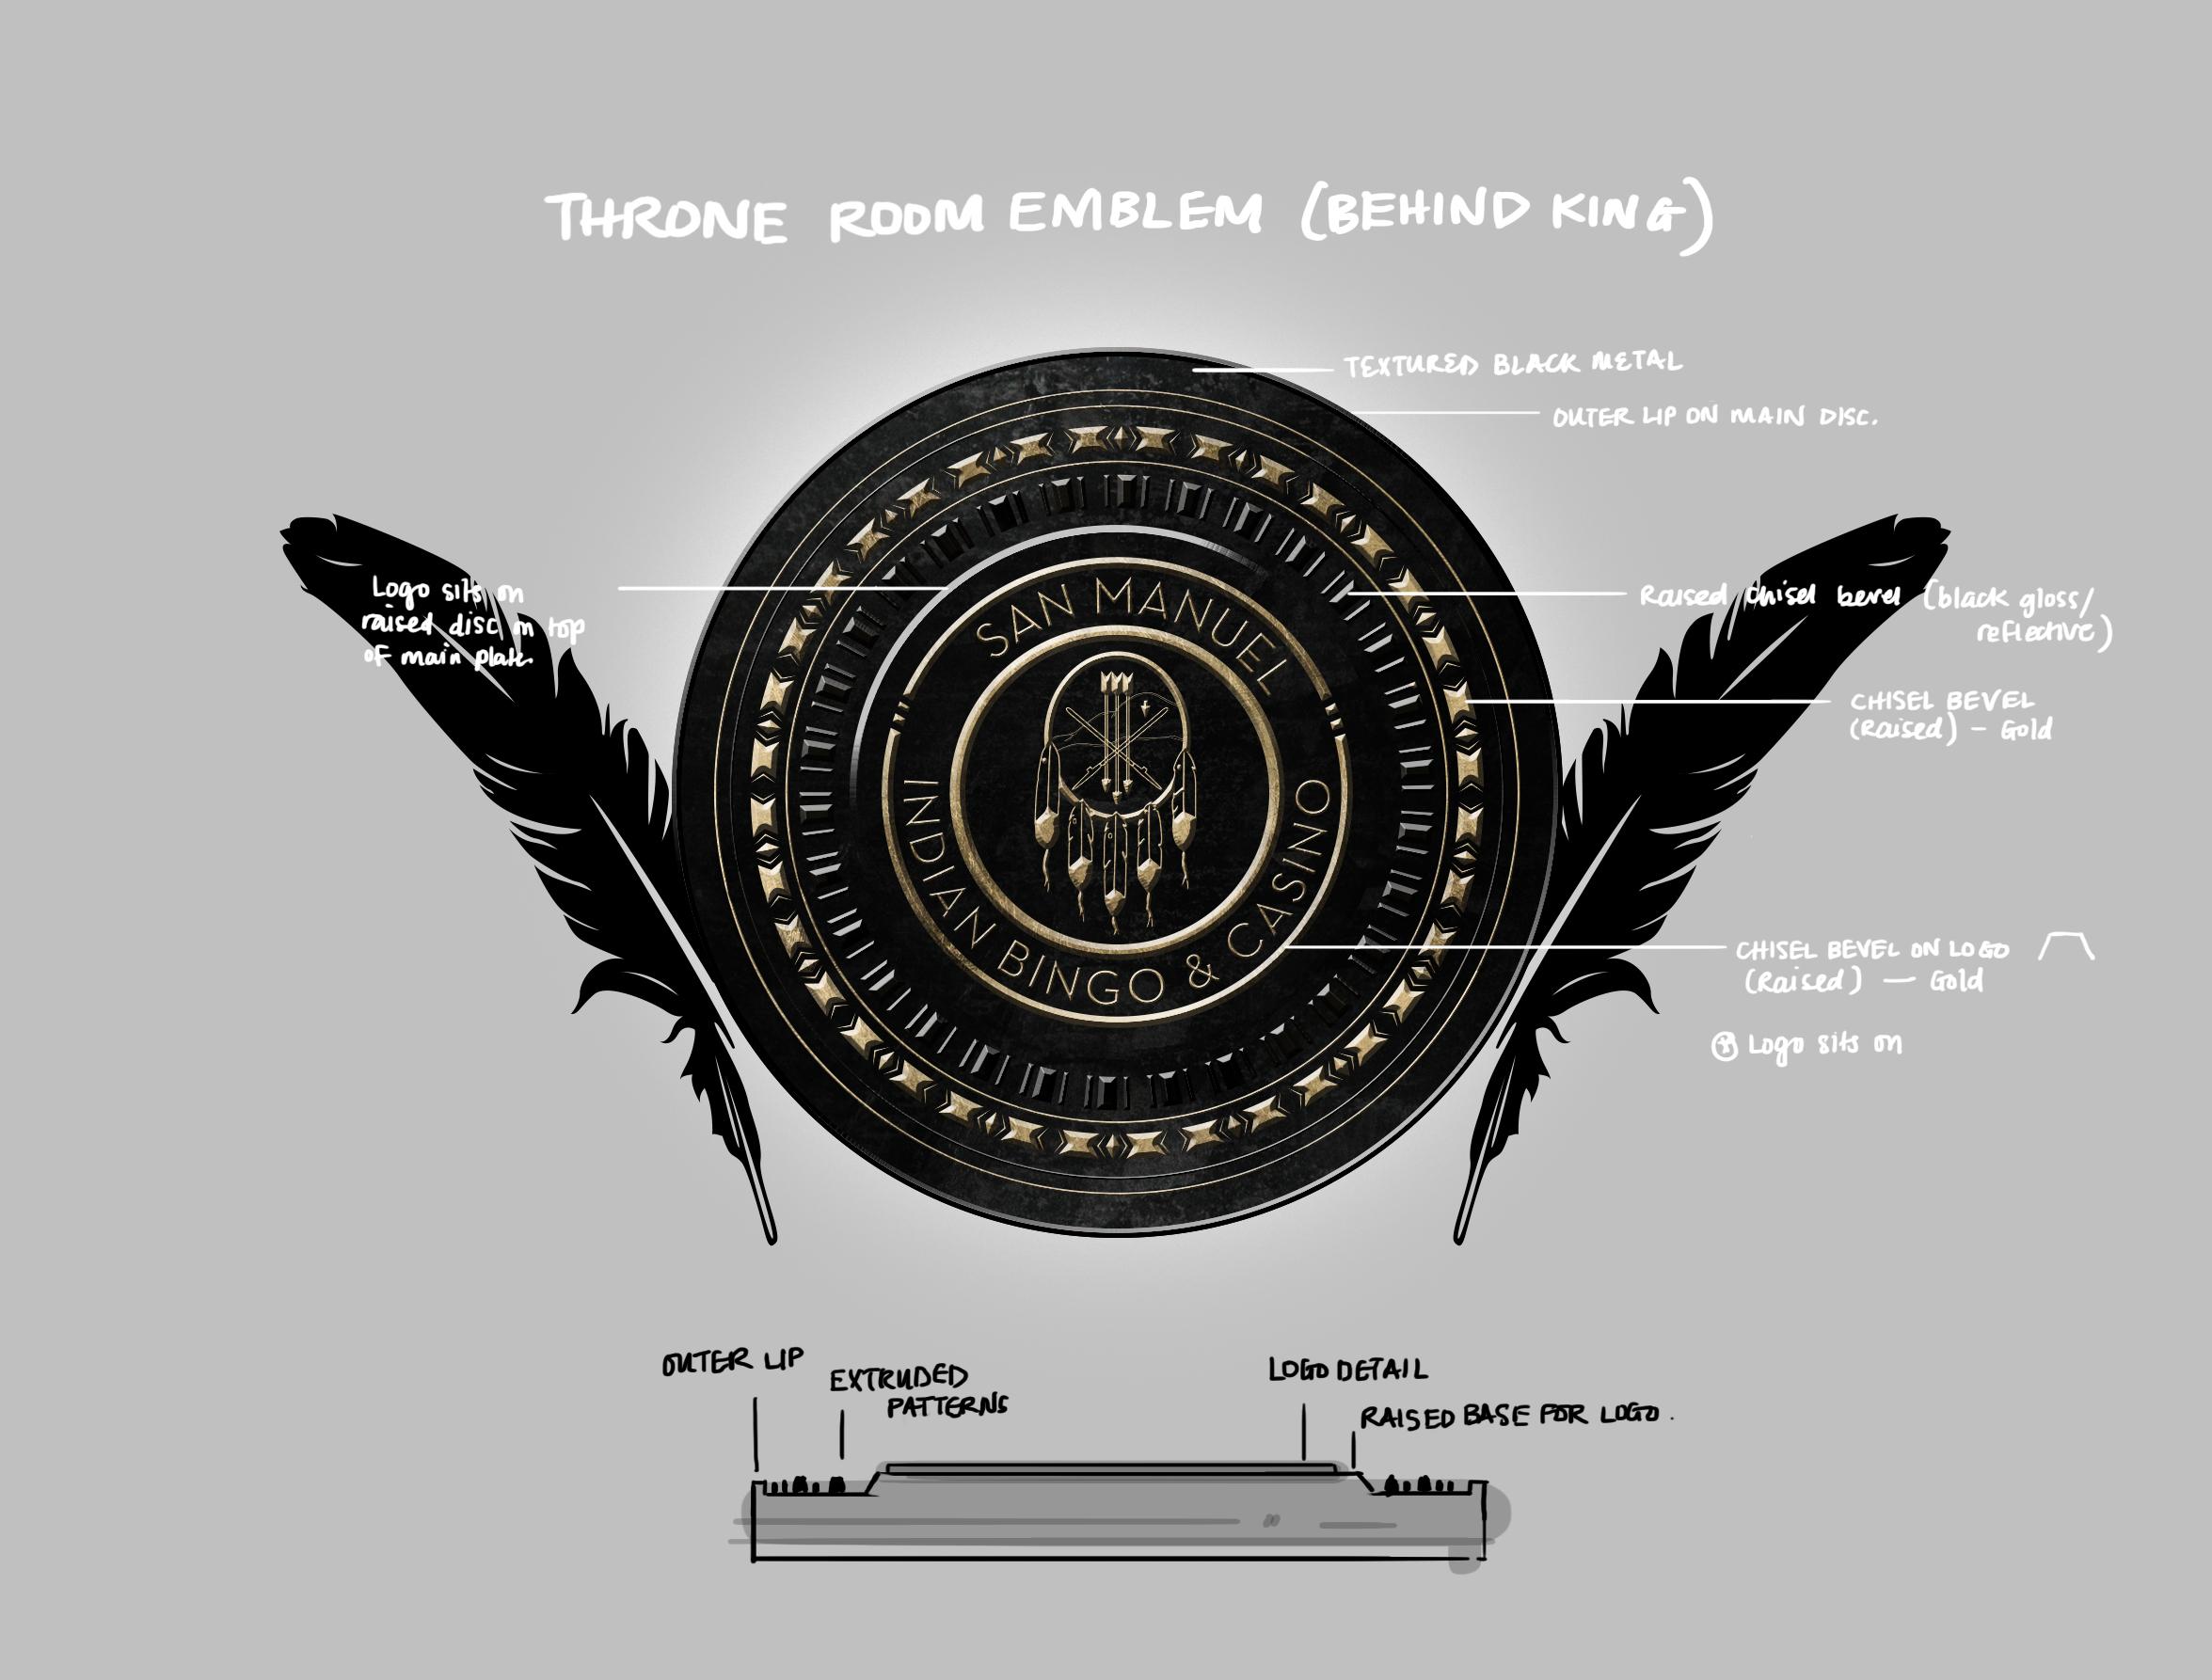 Blackjack_Emblem_v01.jpg